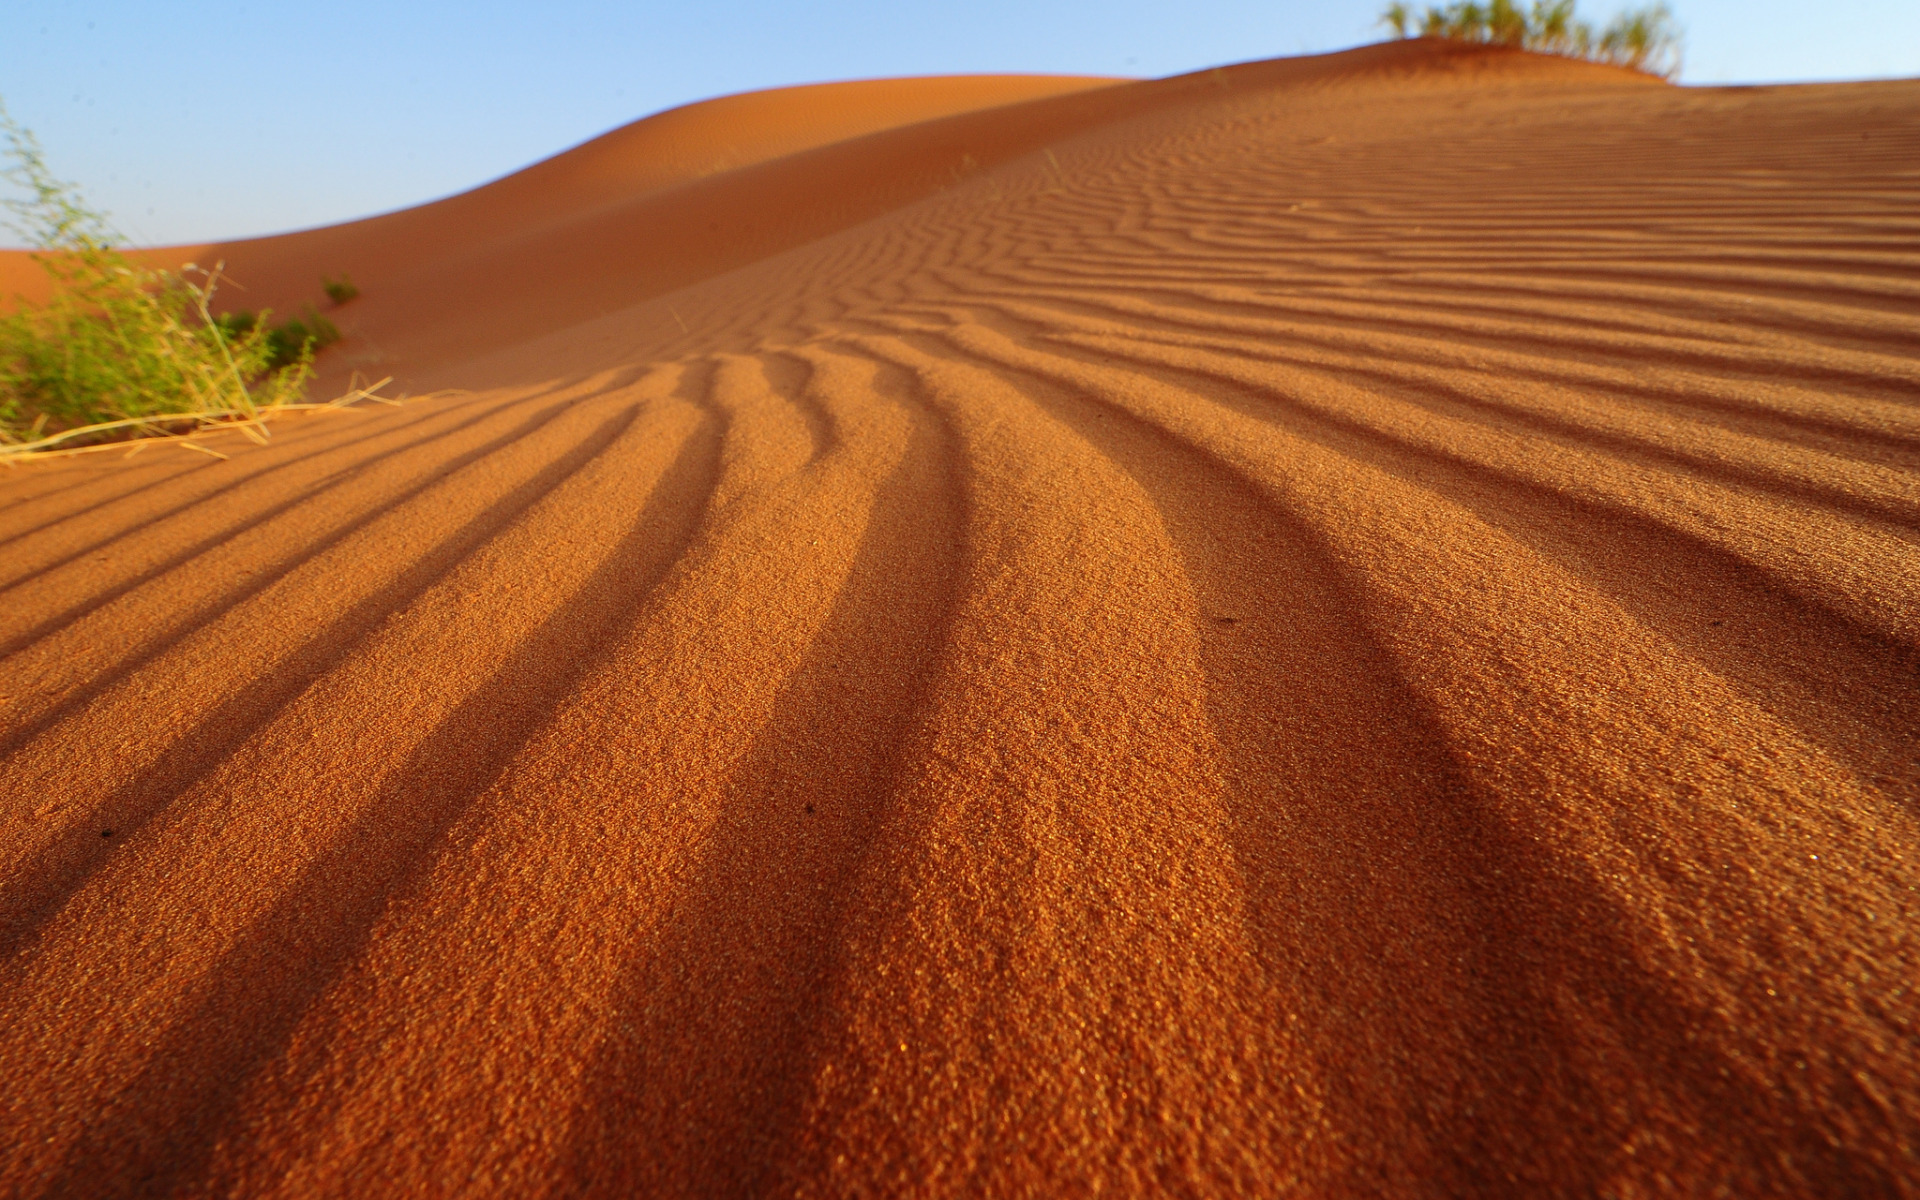 барханы пустыня дюны  № 1291847 бесплатно